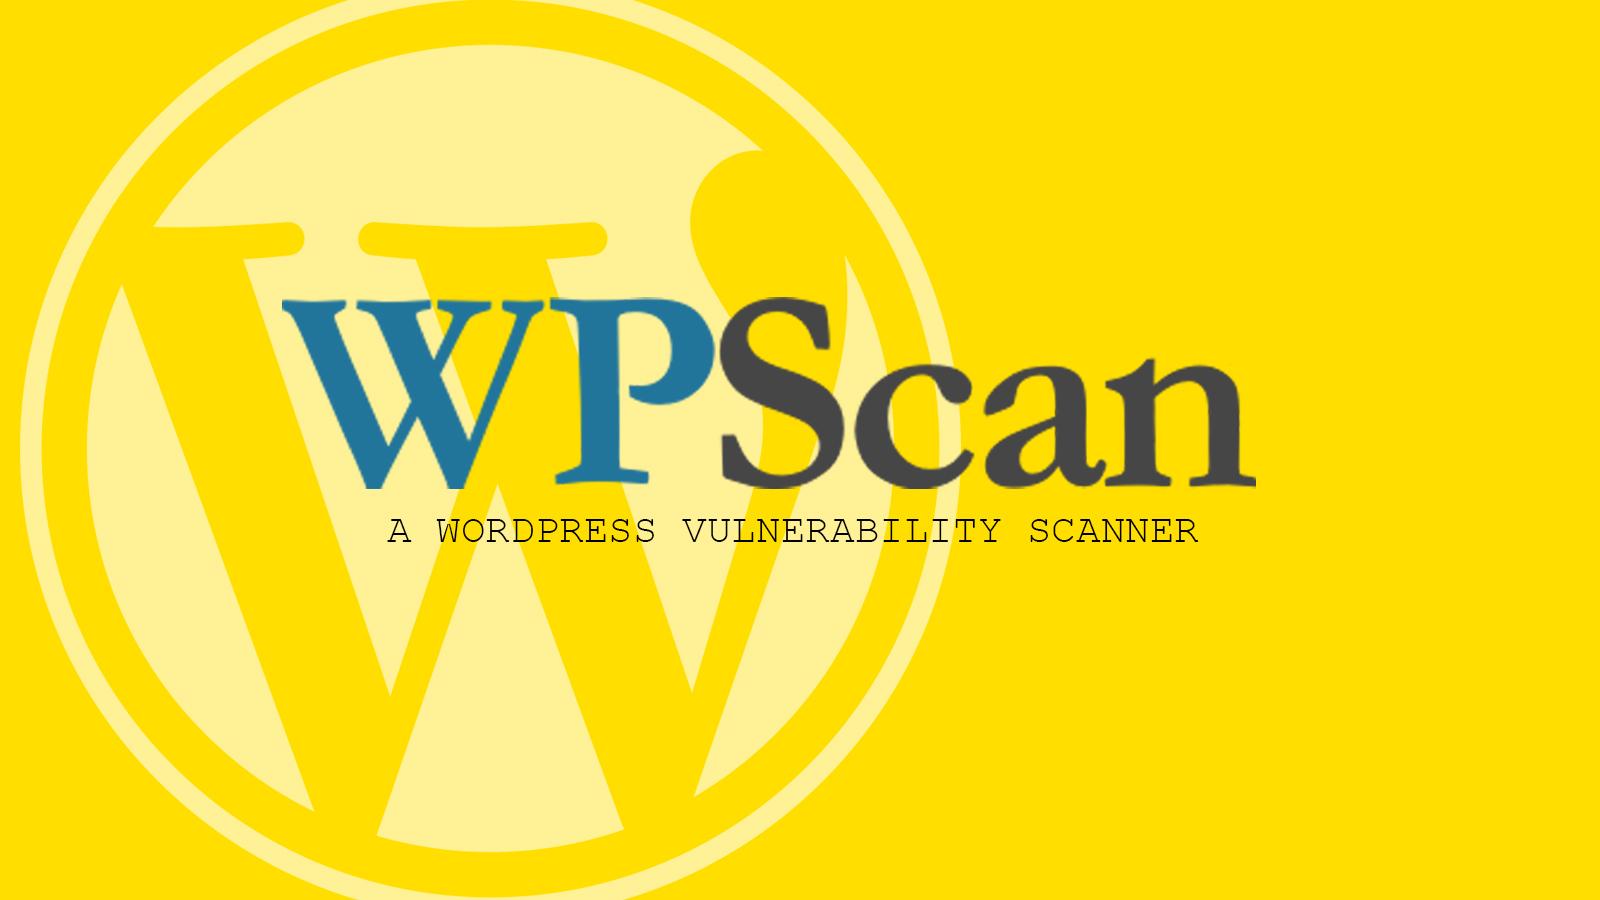 WPScan - A WordPress Vulnerability Scanner